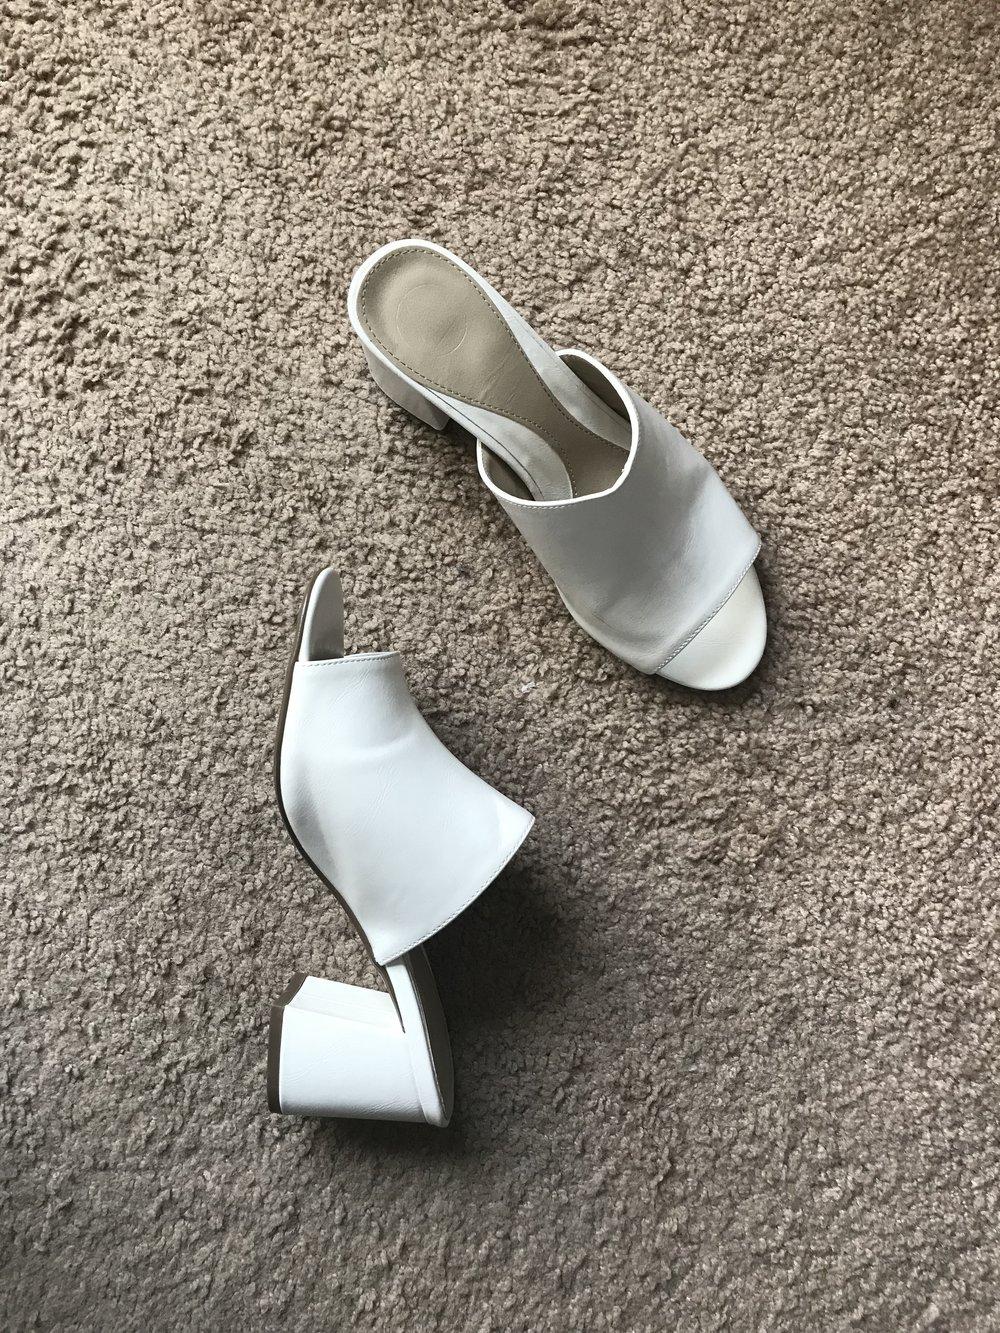 593dc6c59800 MY STYLE  Missguided Shoe Haul+ Style Book — AshleyCamile